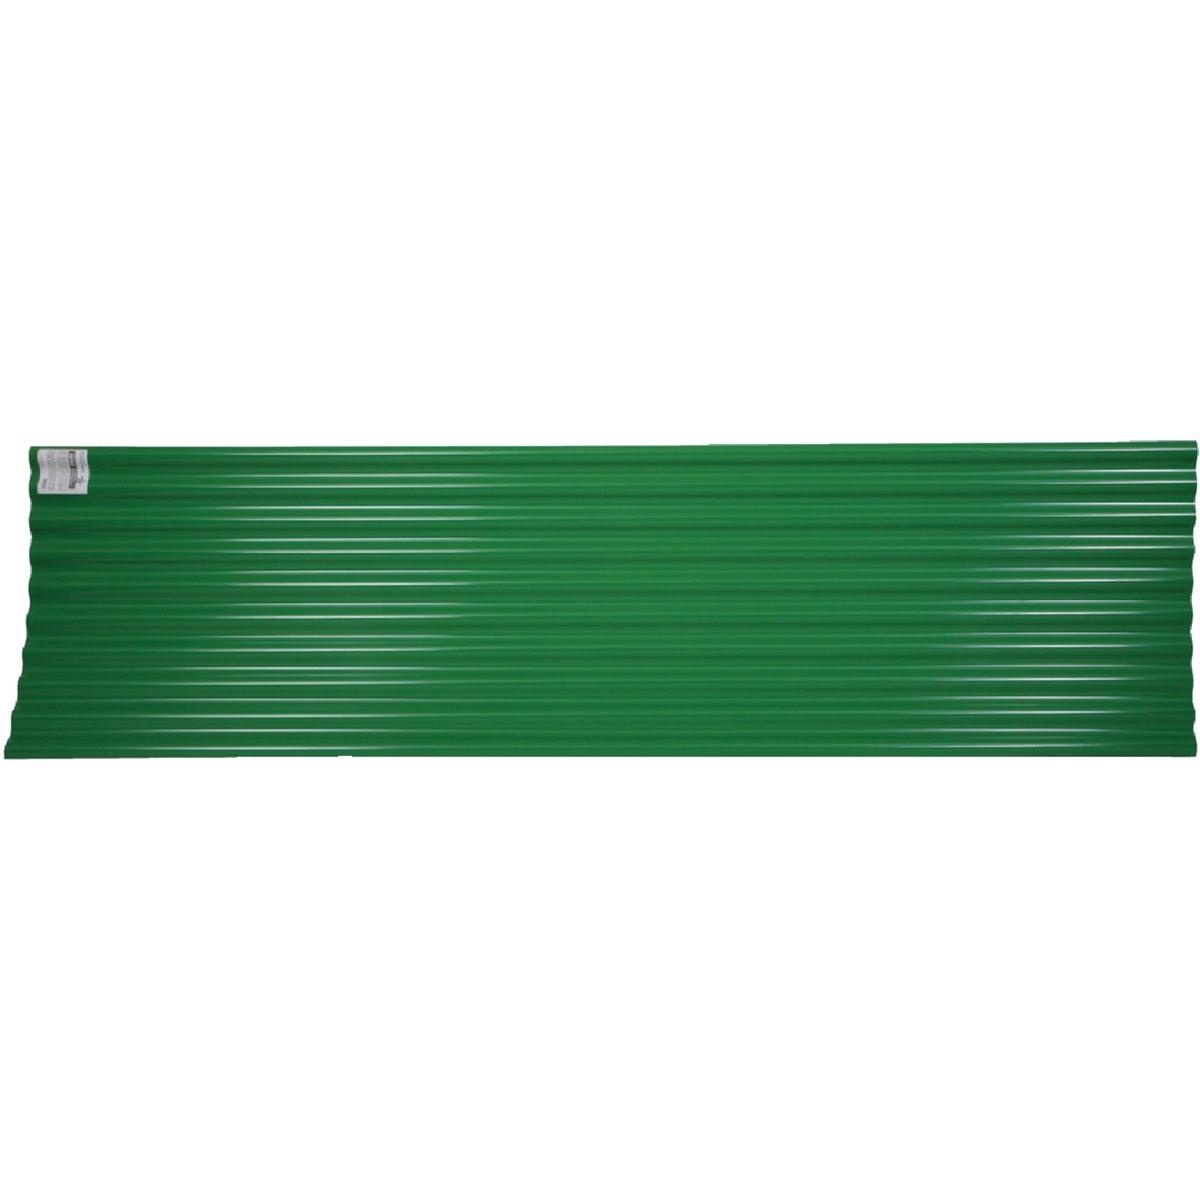 8' GRN CORGTD PVC PANEL